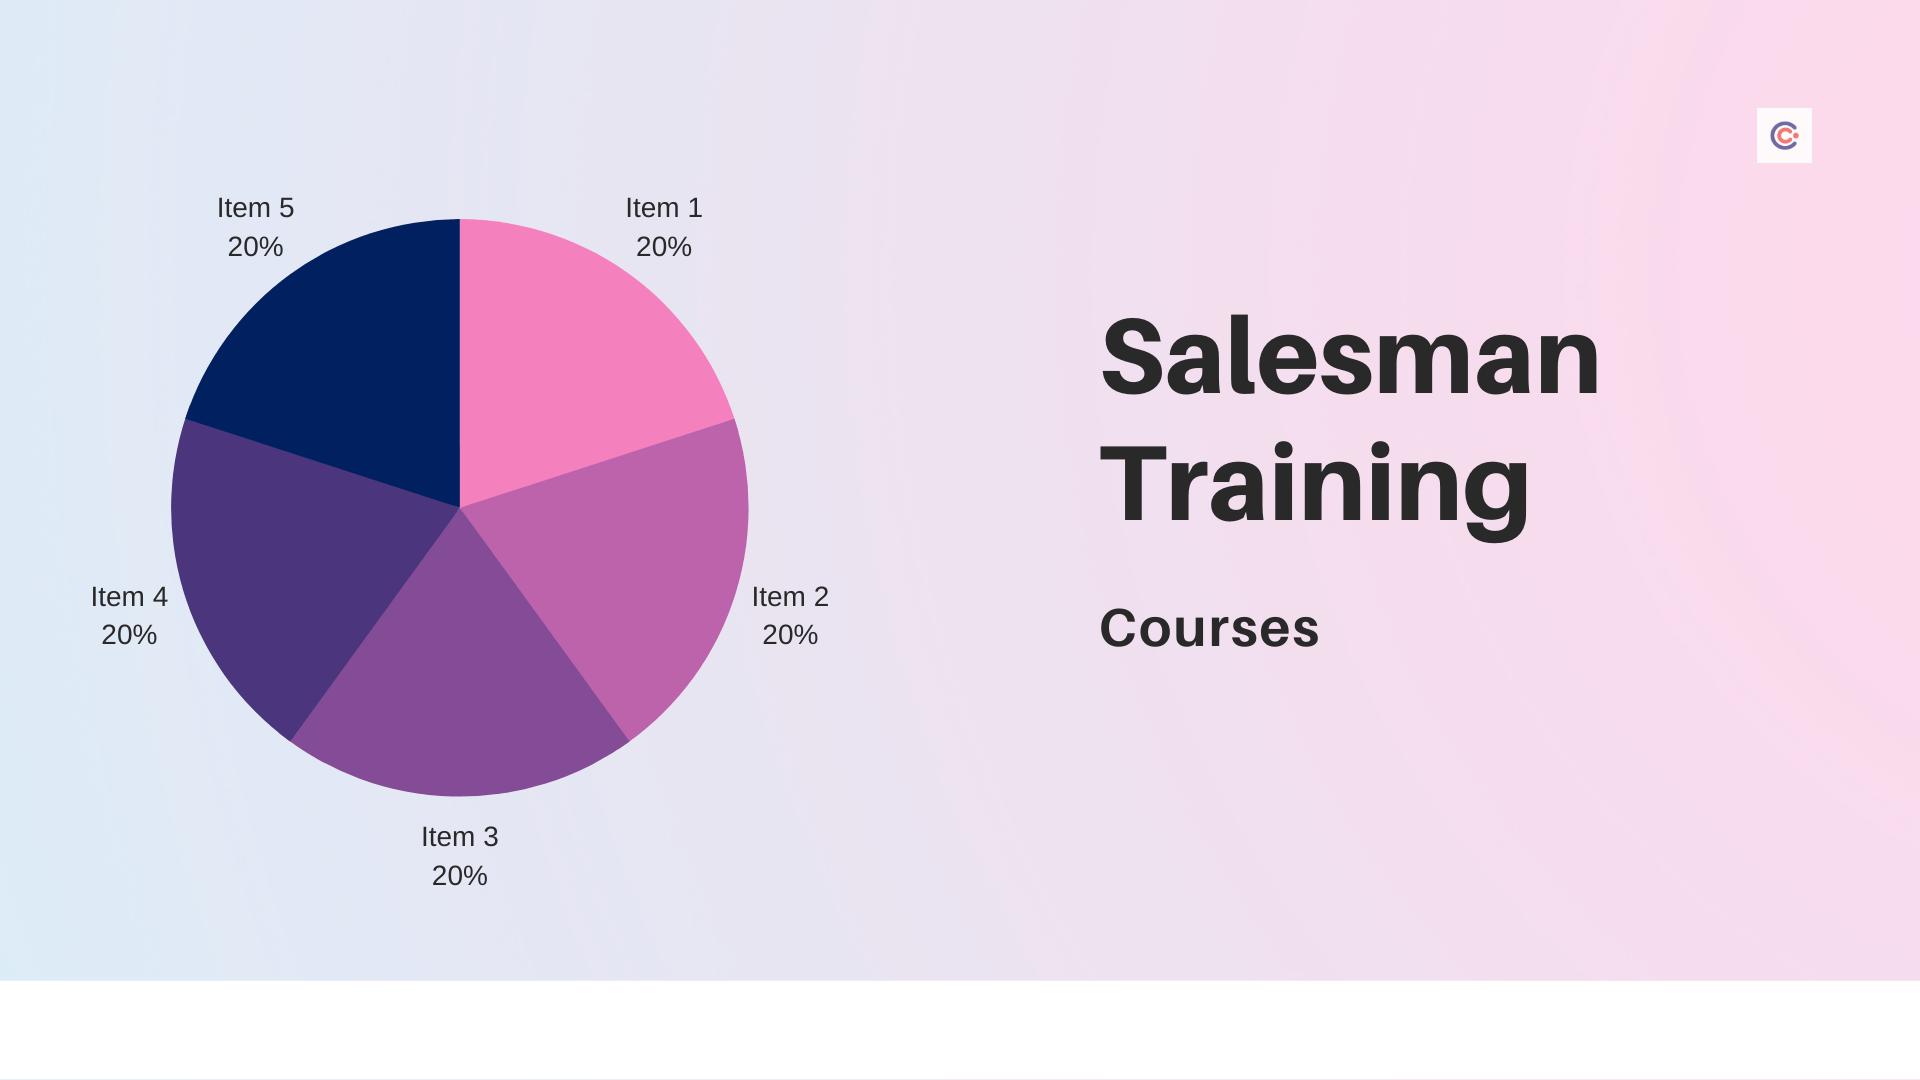 Salesman Training Courses online: 10 of the Best